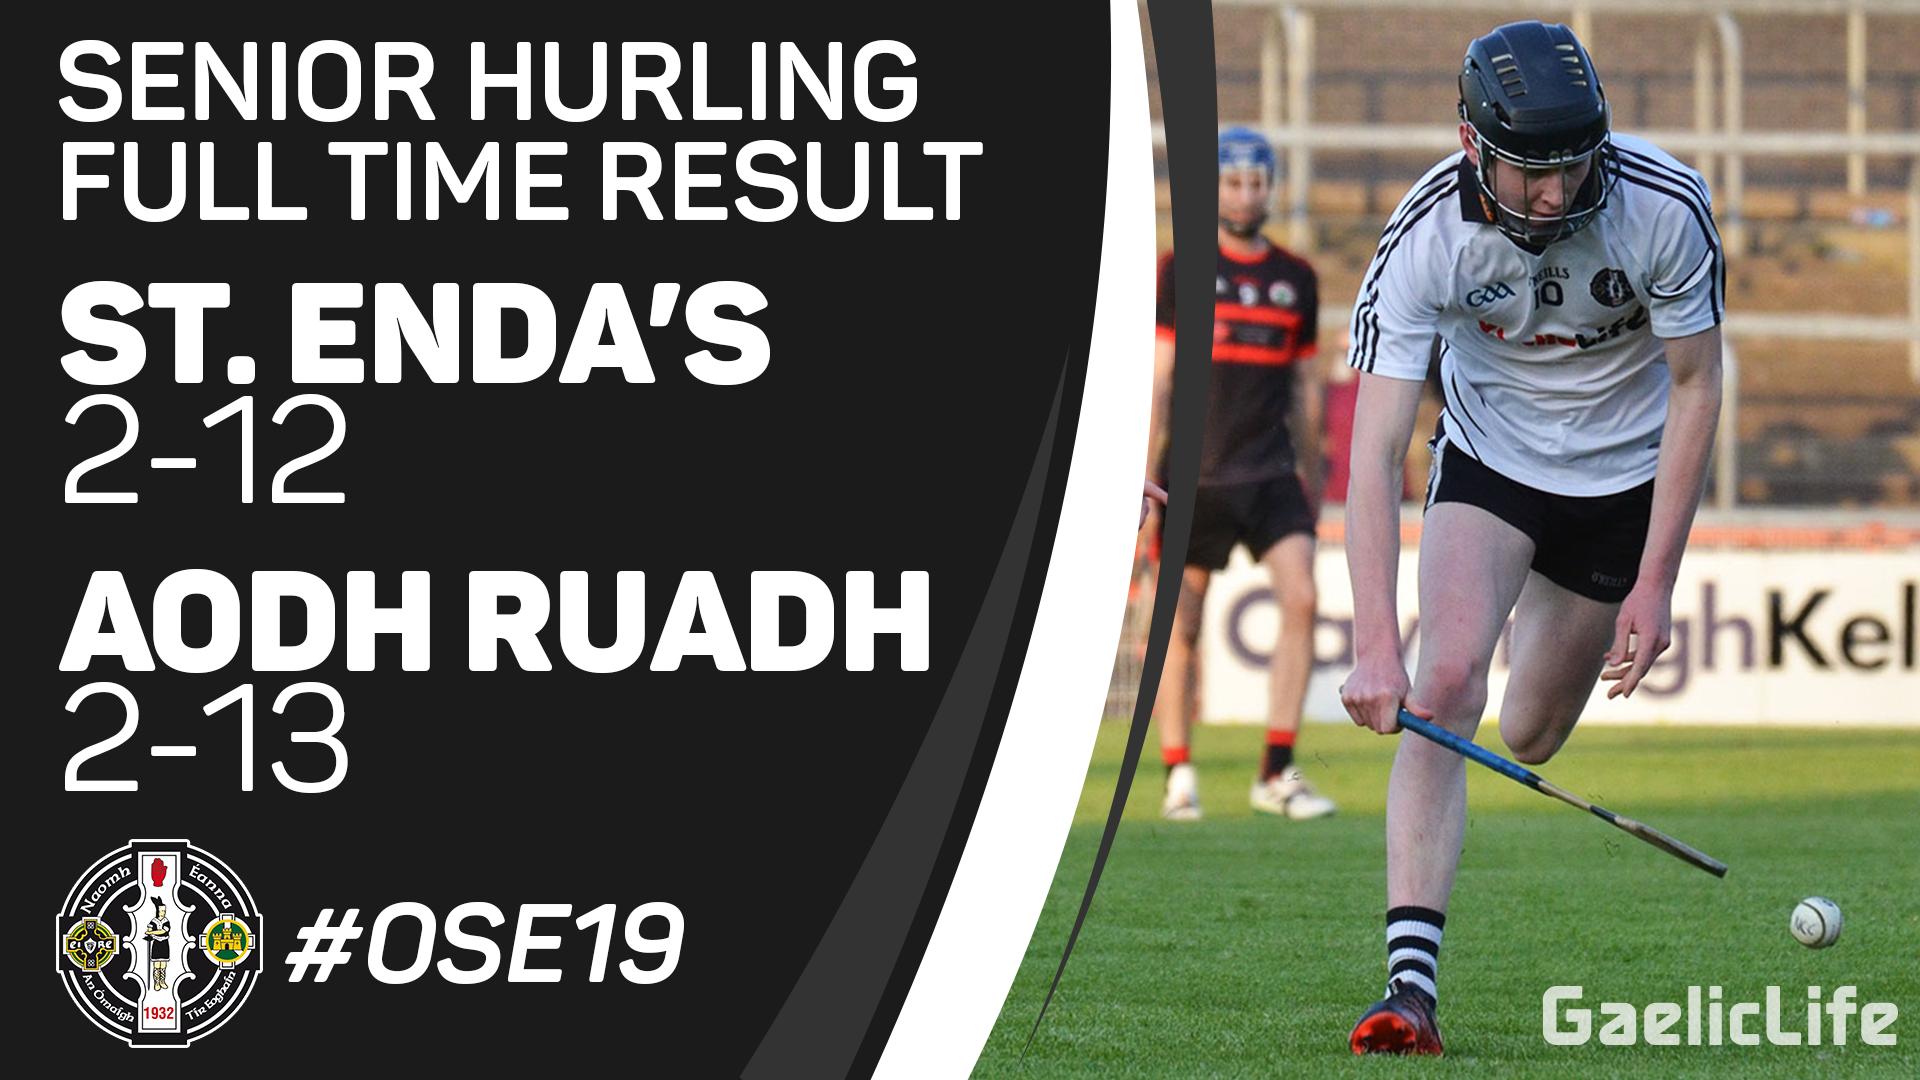 Match Report – Senior Hurling v Aodh Ruadh